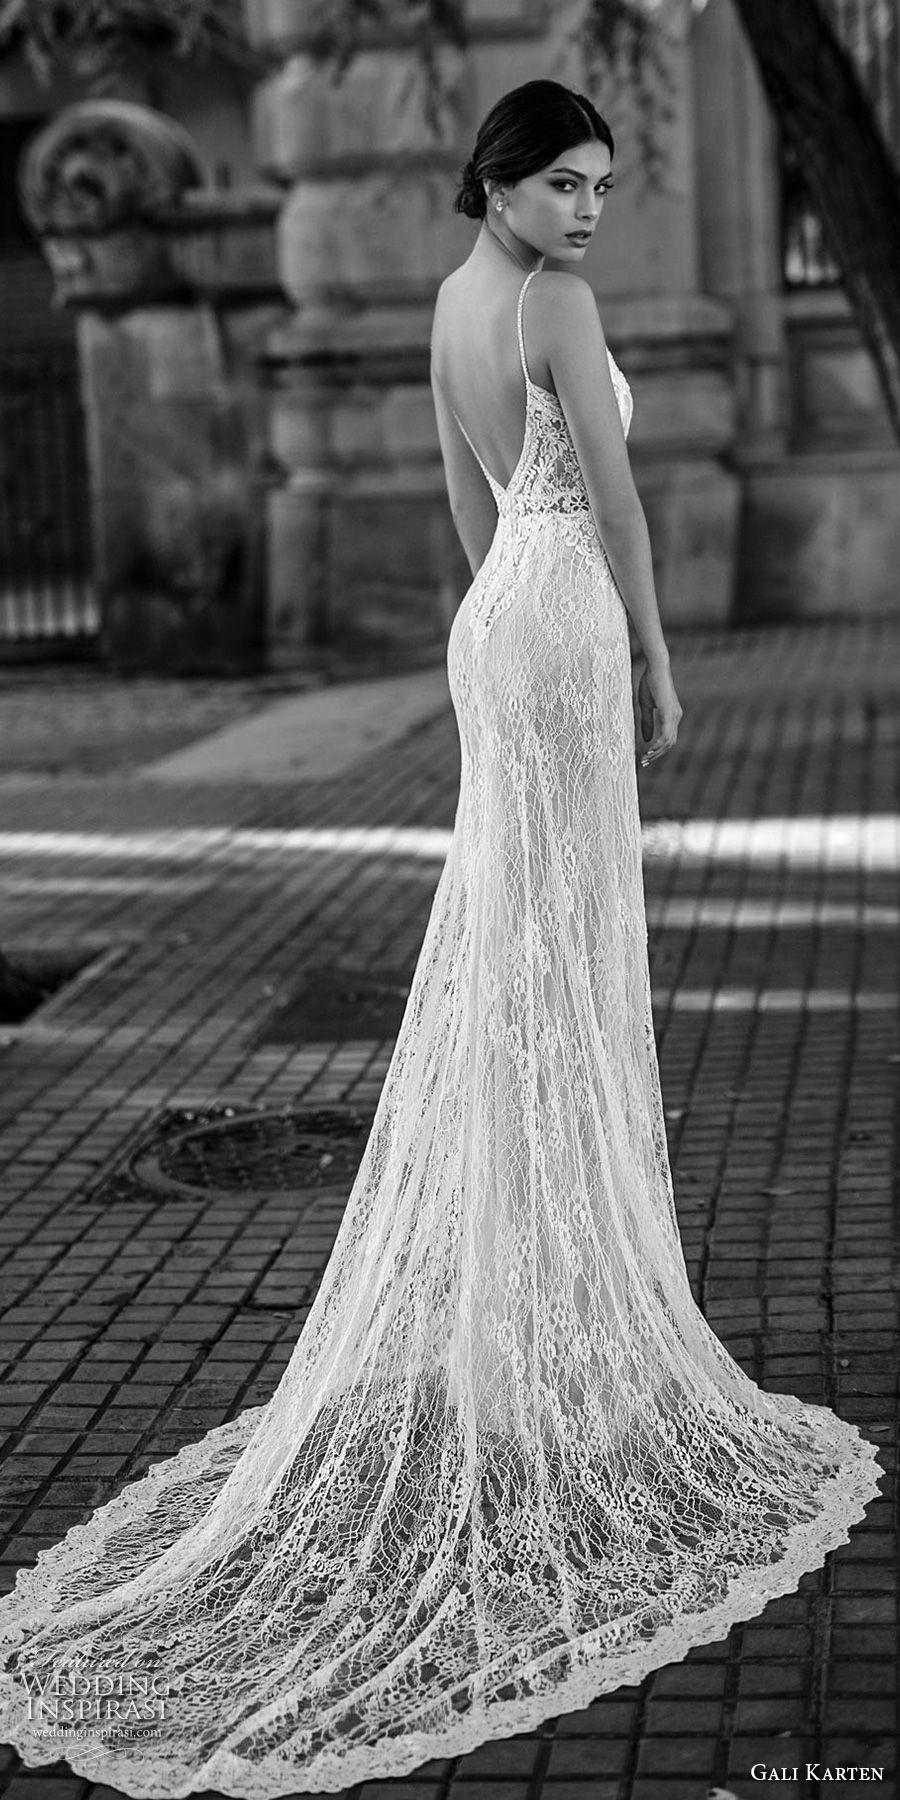 c52c54a2682 gali karten 2017 bridal spaghetti strap v neck full embellishment elegant  sheath wedding dress open back chapel train (6) bv -- Gali Karten 2017  Wedding ...